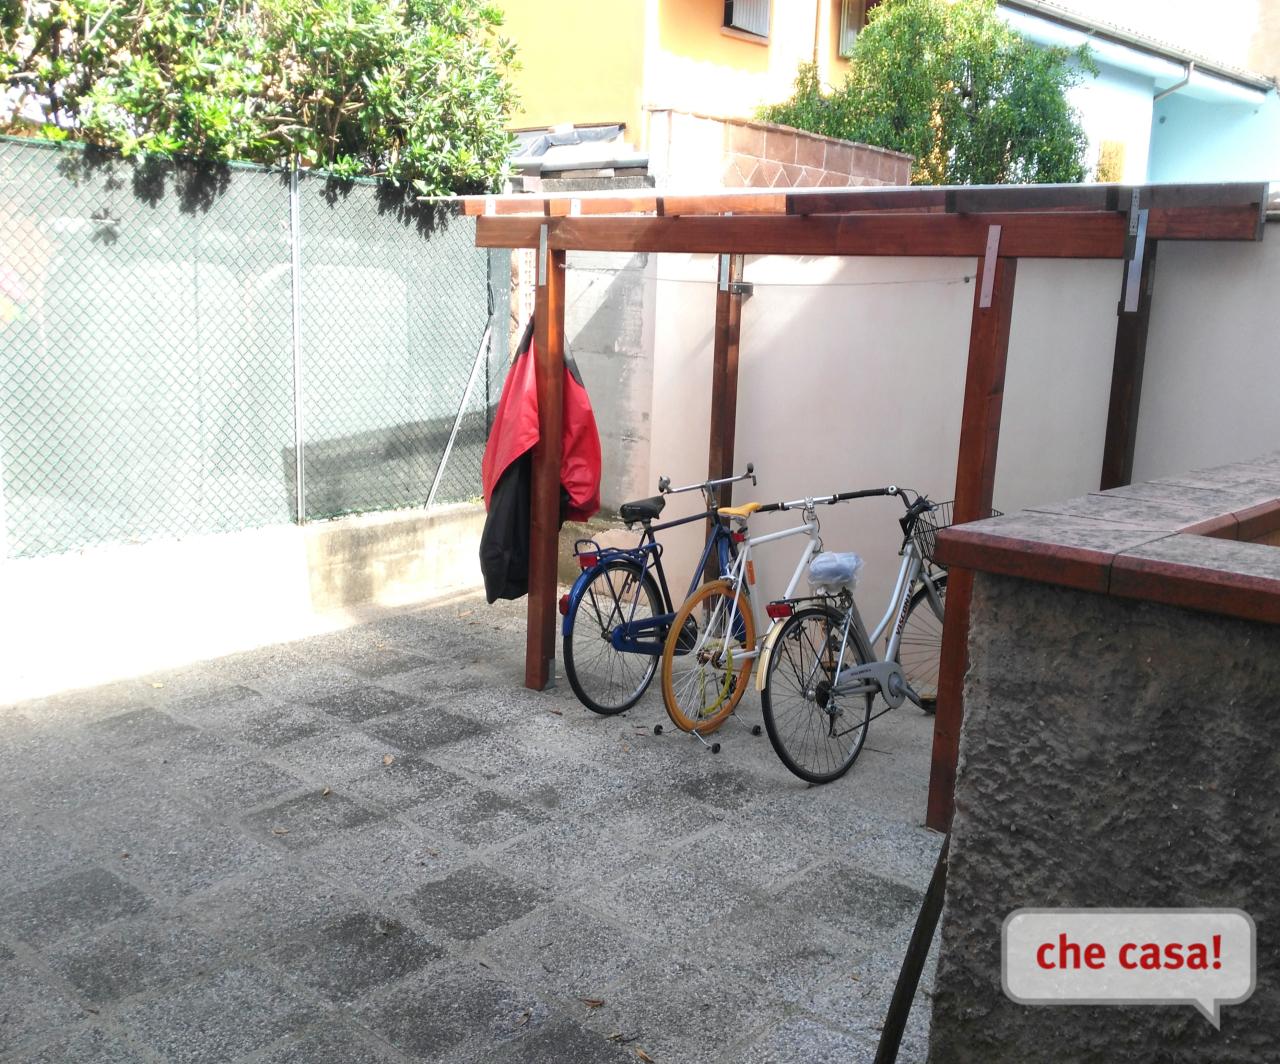 Bilocale Cesena Corso Comandini Ubaldo 10 7